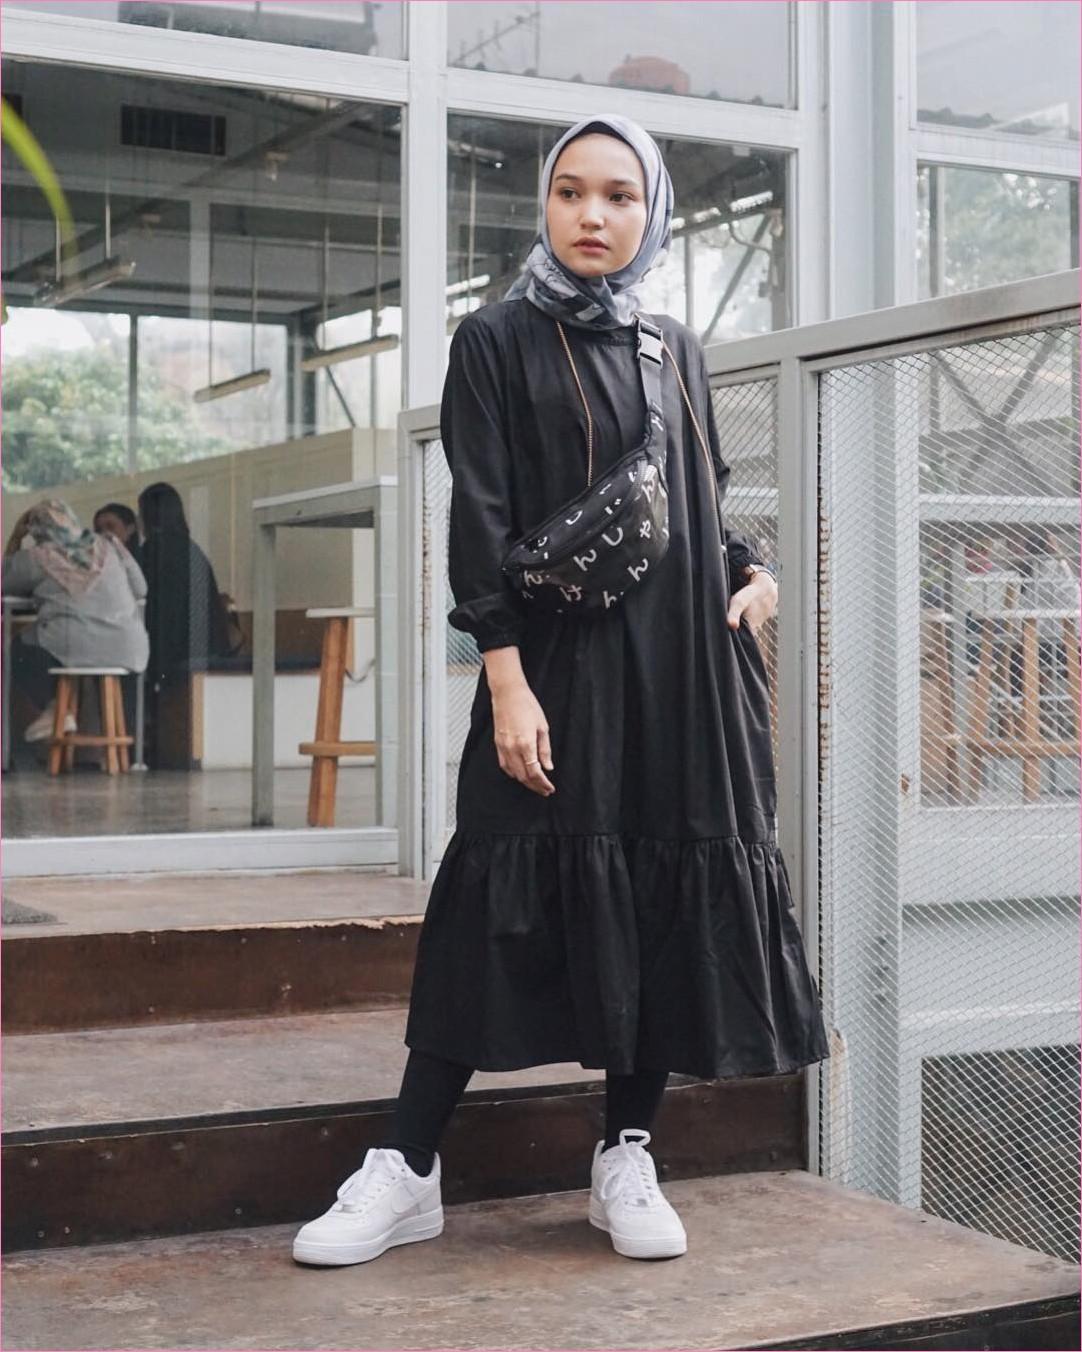 Outfit Baju Tunic Untuk Hijabers Ala Selebgram 2018 baju tunic hitam kets sneakers putih legging slingbags hijab square kerudung segiempat abu tua ciput rajut jam tangan ootd trendy kekinian kaca tangga kayu cafe jam tangan